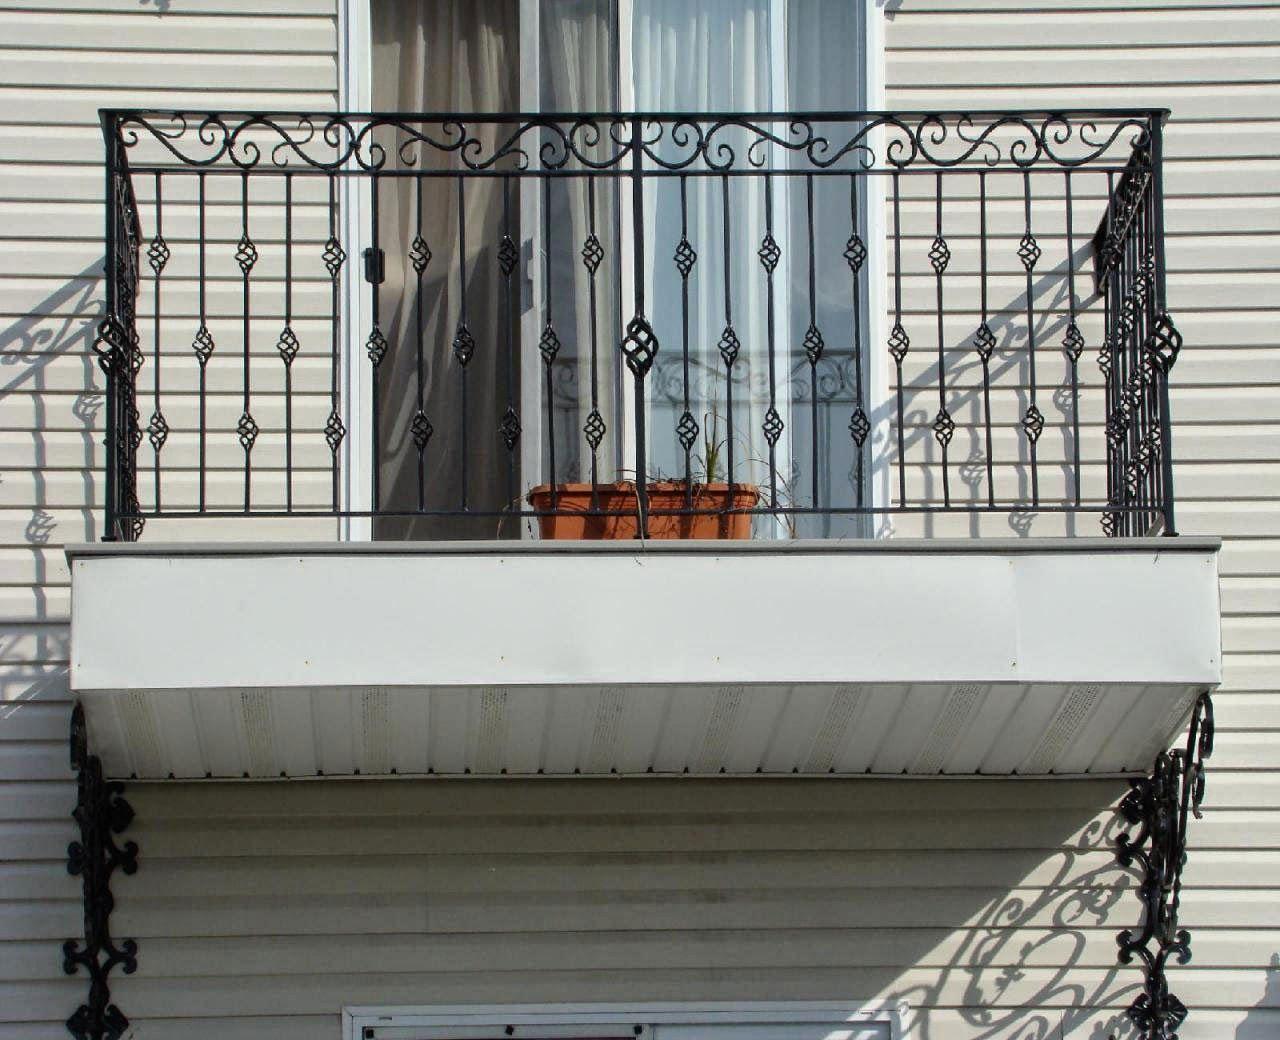 47+ Balcony railing design iron ideas in 2021